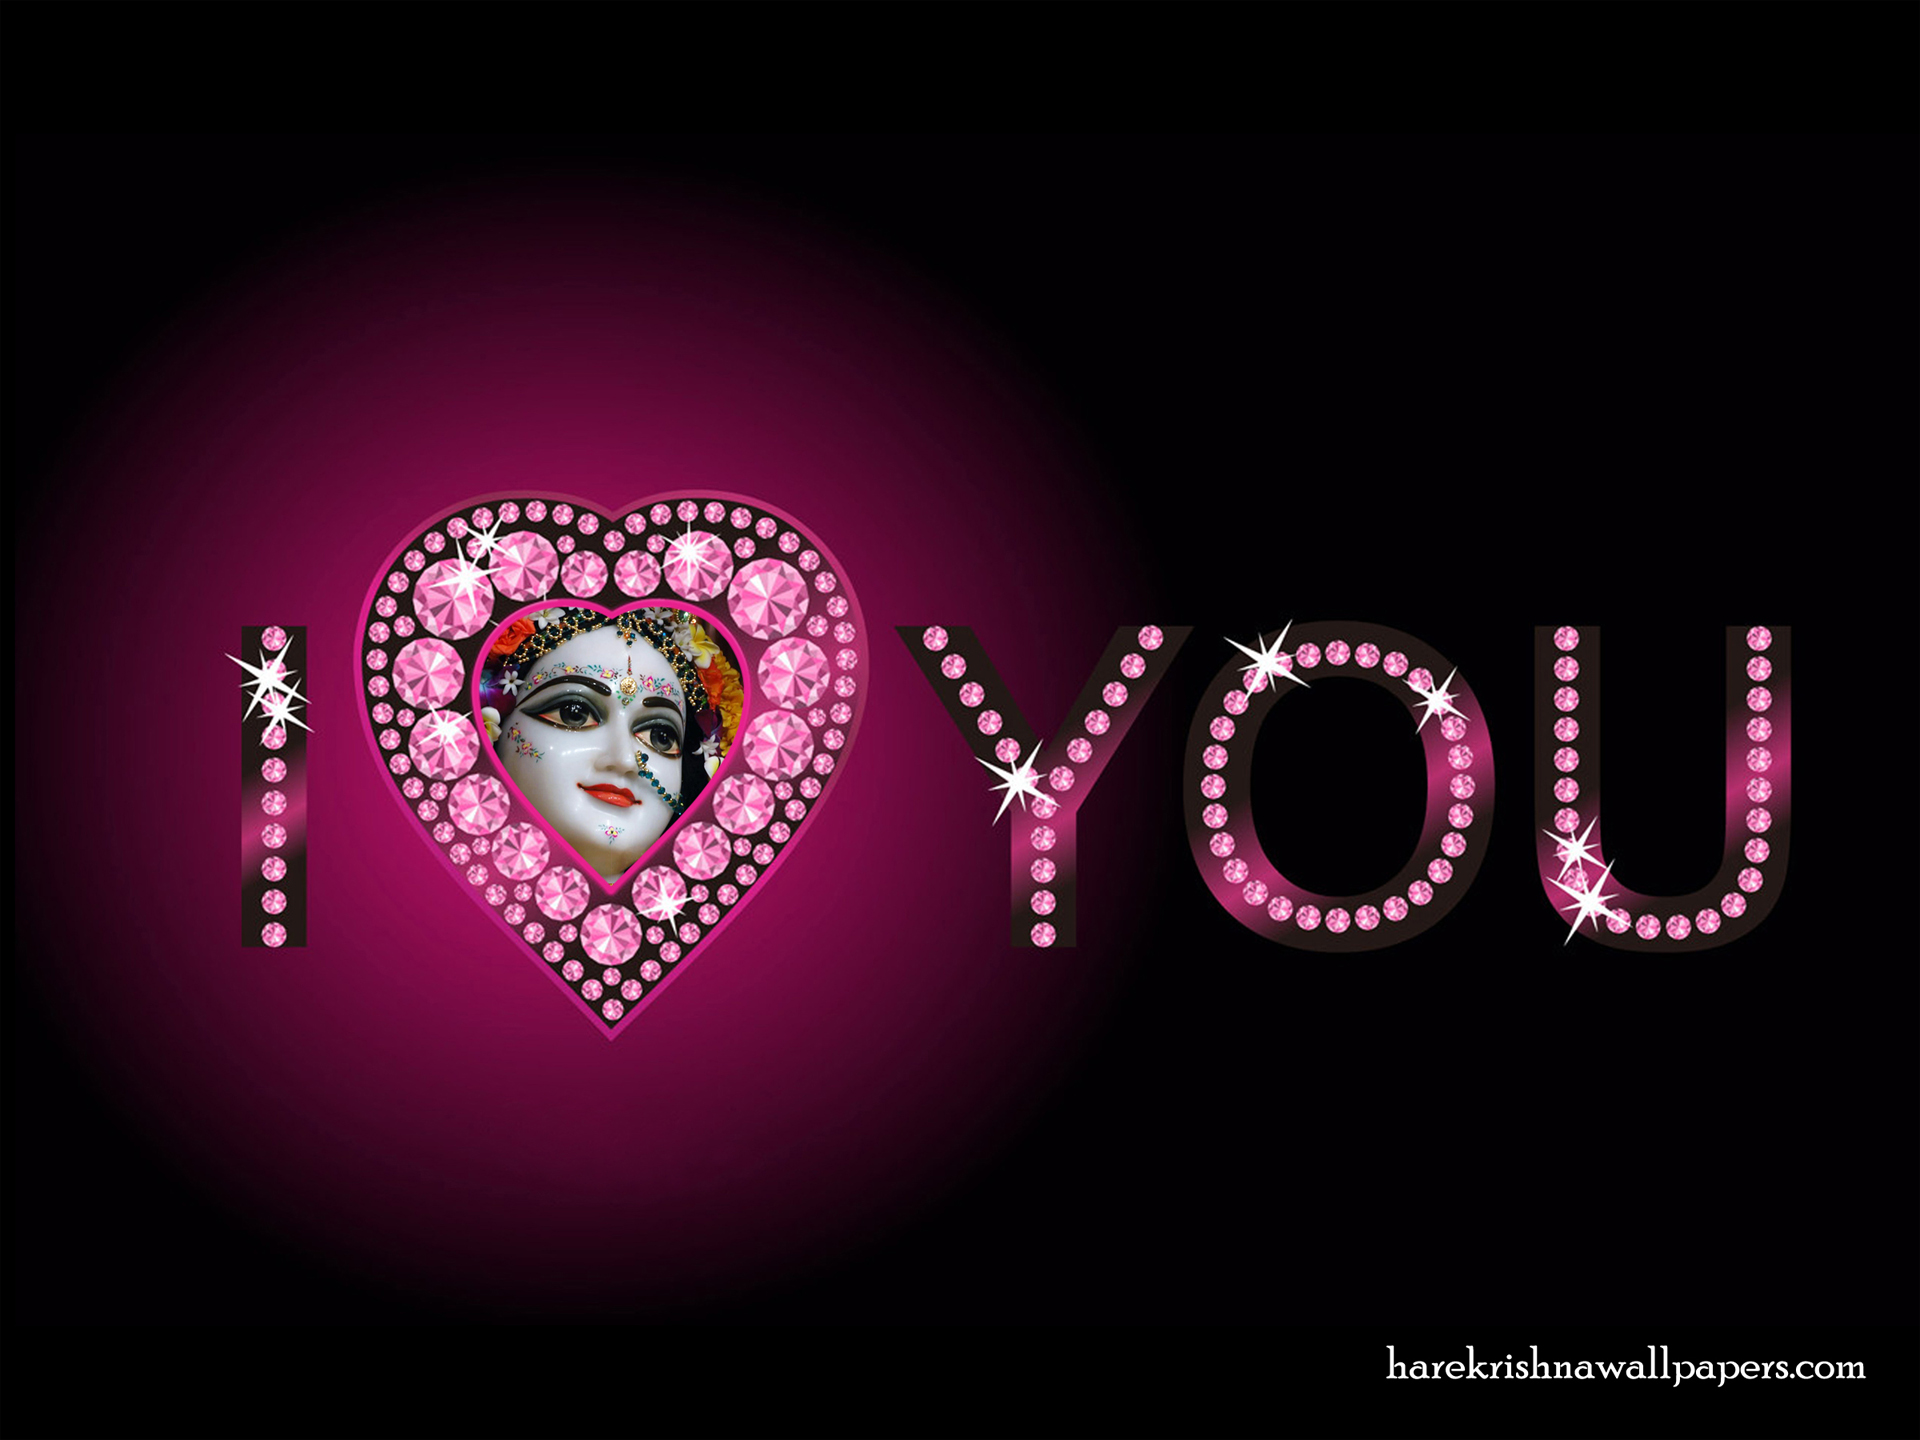 I Love You Radharani Wallpaper (013) Size 1920x1440 Download